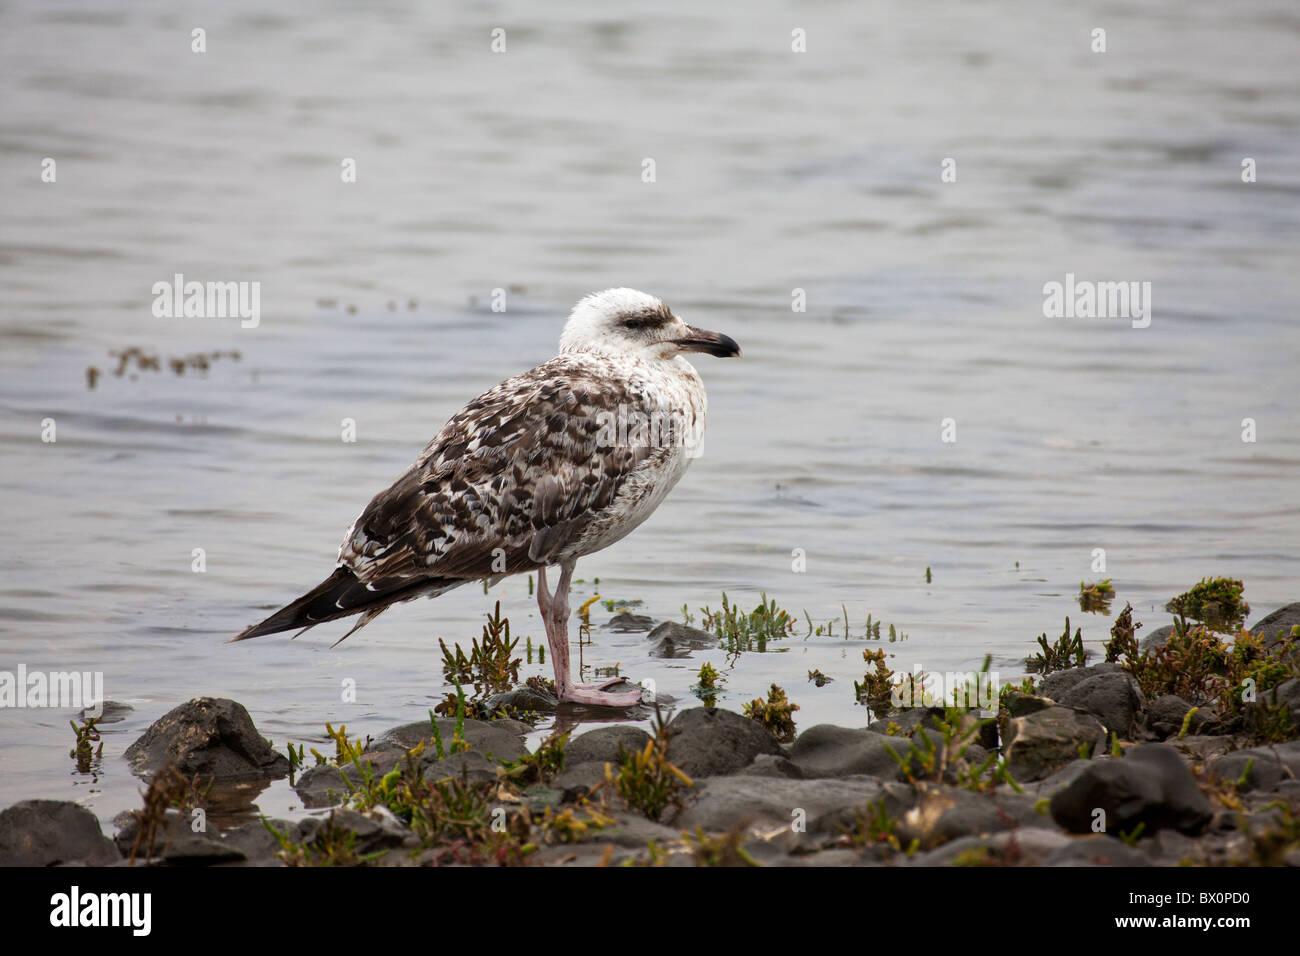 Great Black=backed Gull Larus marinus 1st winter immature standing at water's edge - Stock Image